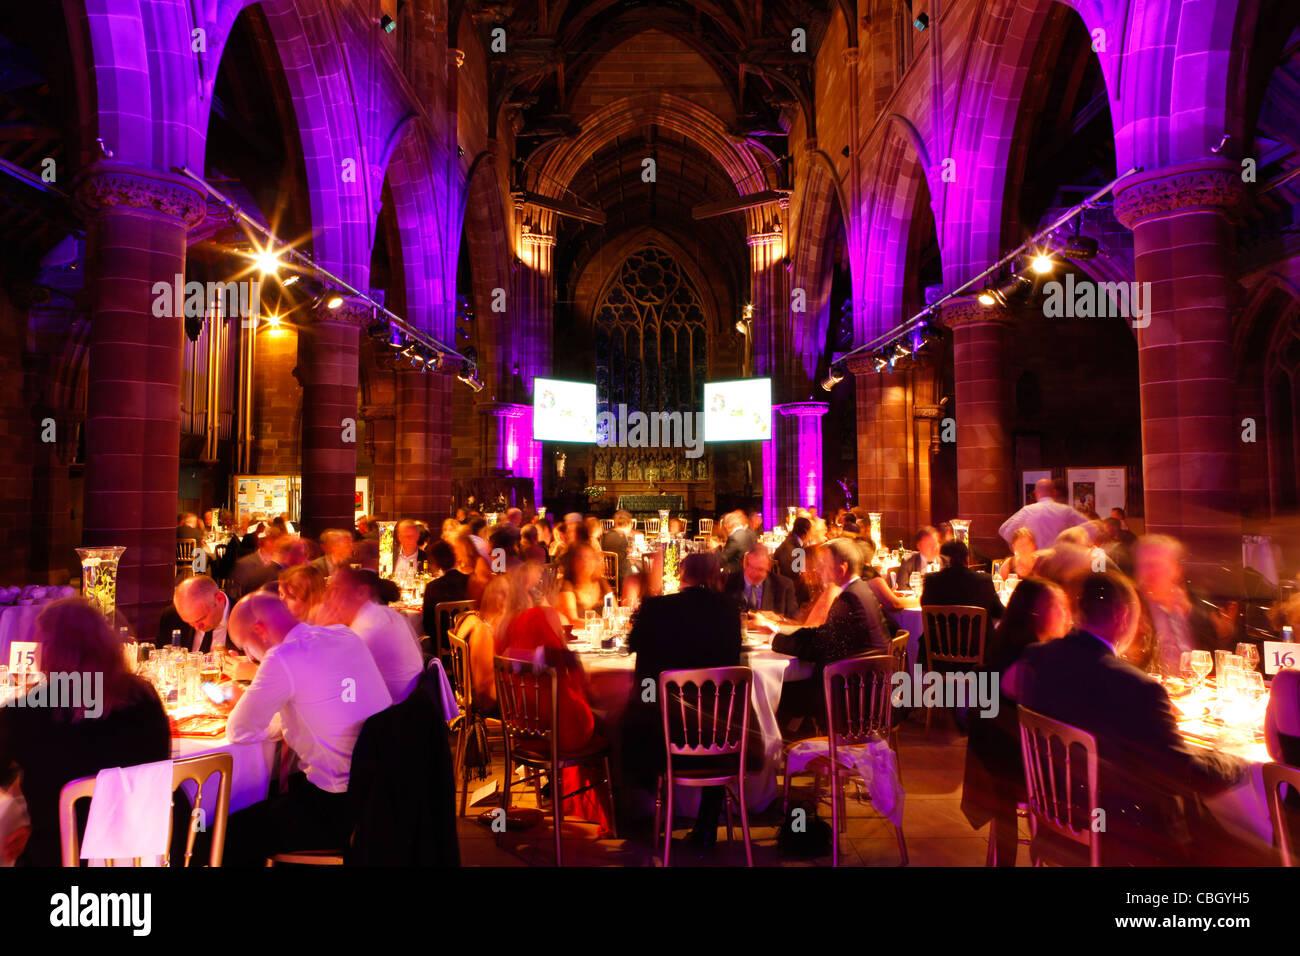 Evening Dinner at St Martins Church, Birmingham. - Stock Image